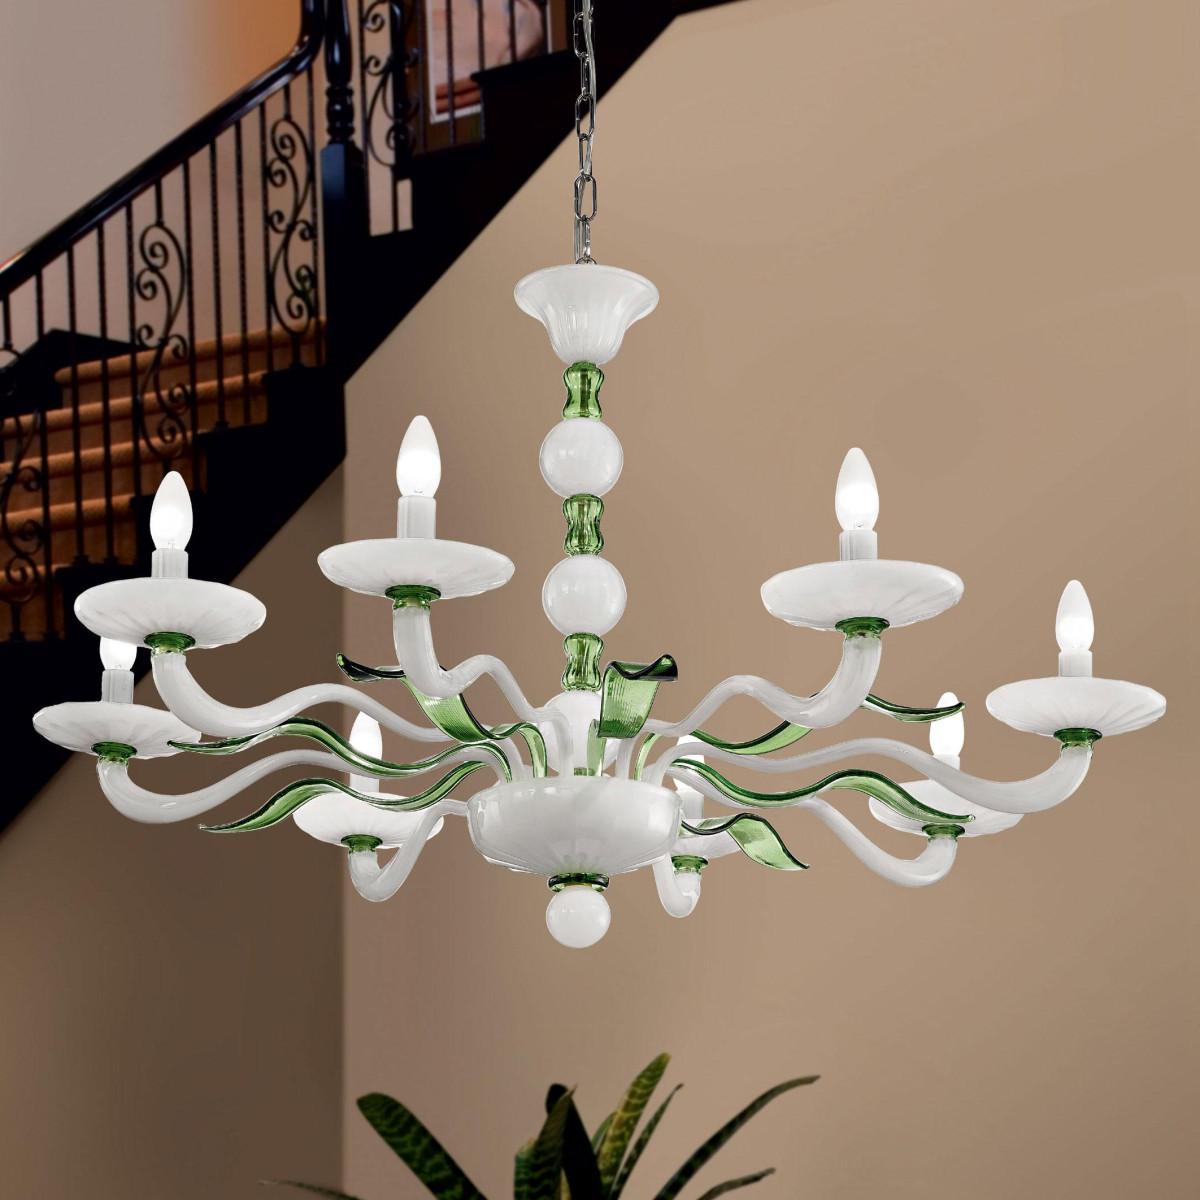 hypnos lustre en cristal de murano murano glass chandeliers. Black Bedroom Furniture Sets. Home Design Ideas